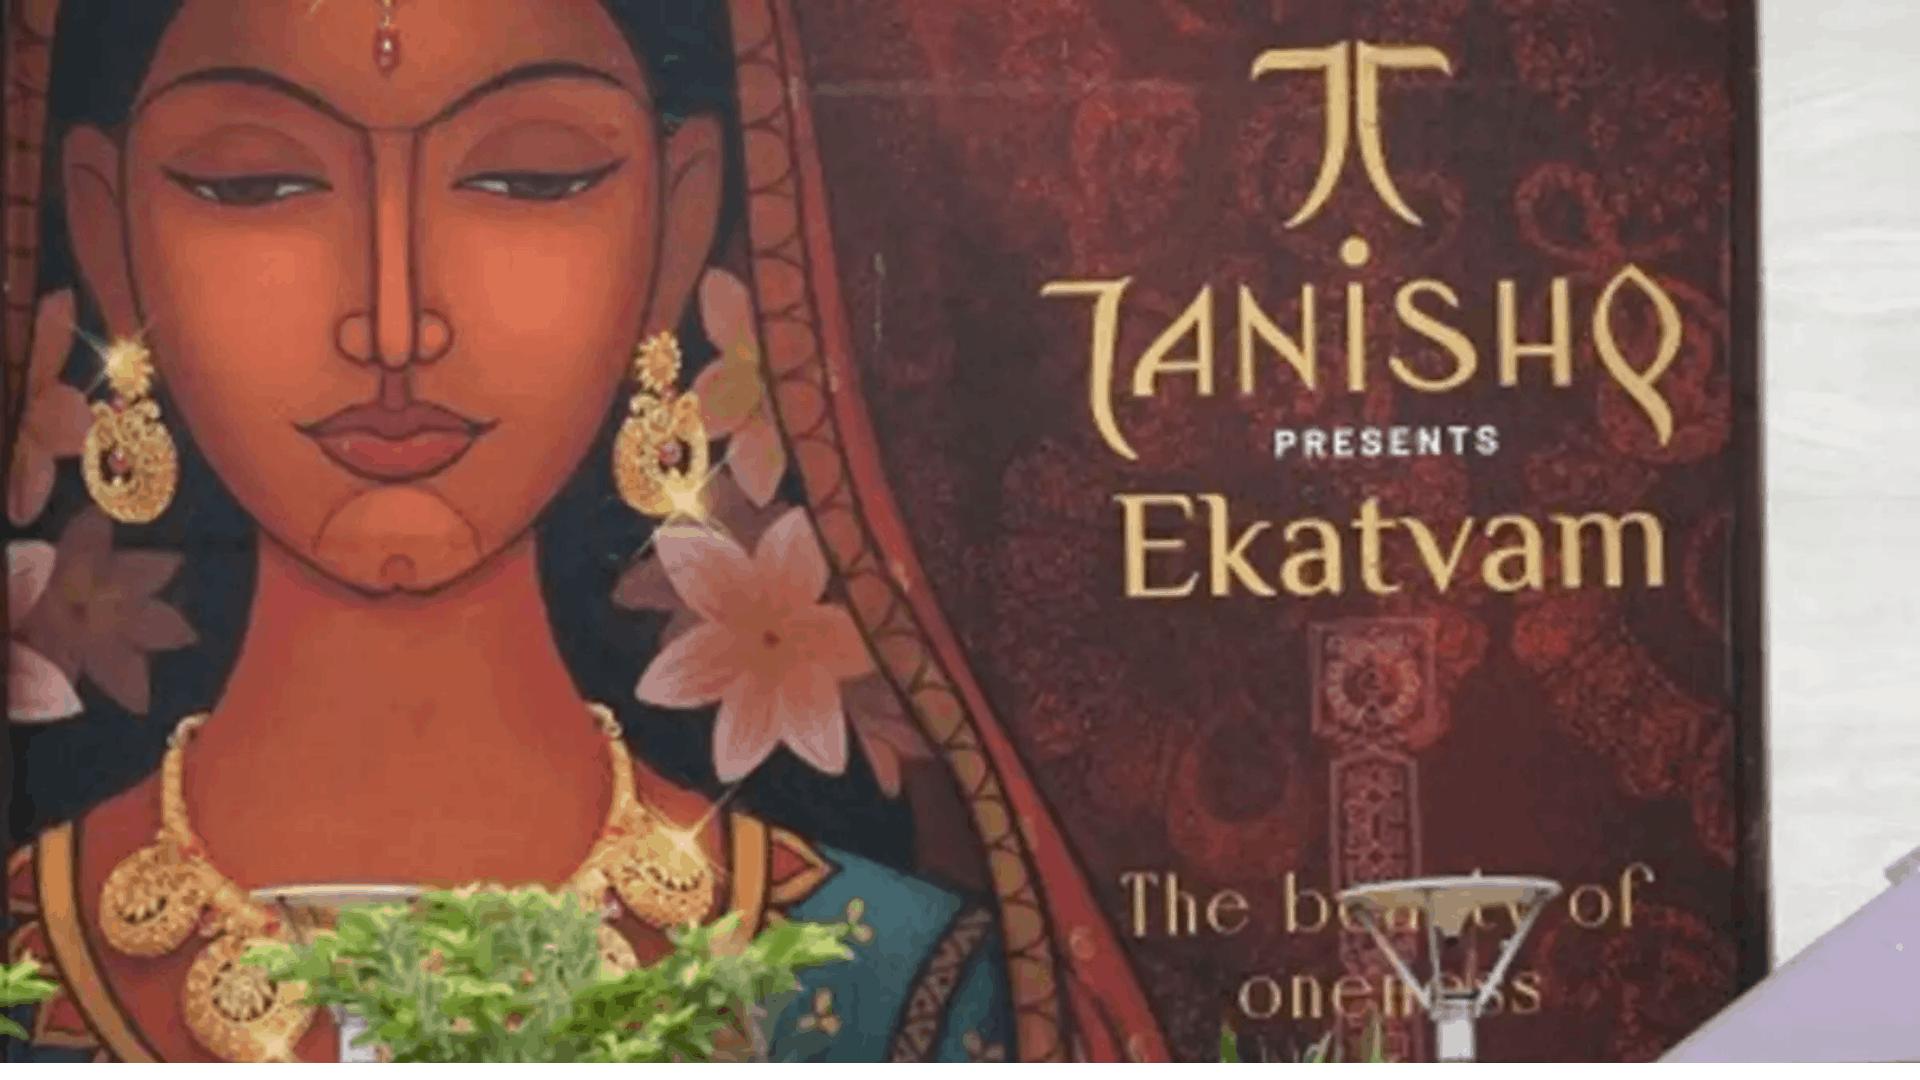 Controversy Around The Tanishq Ad